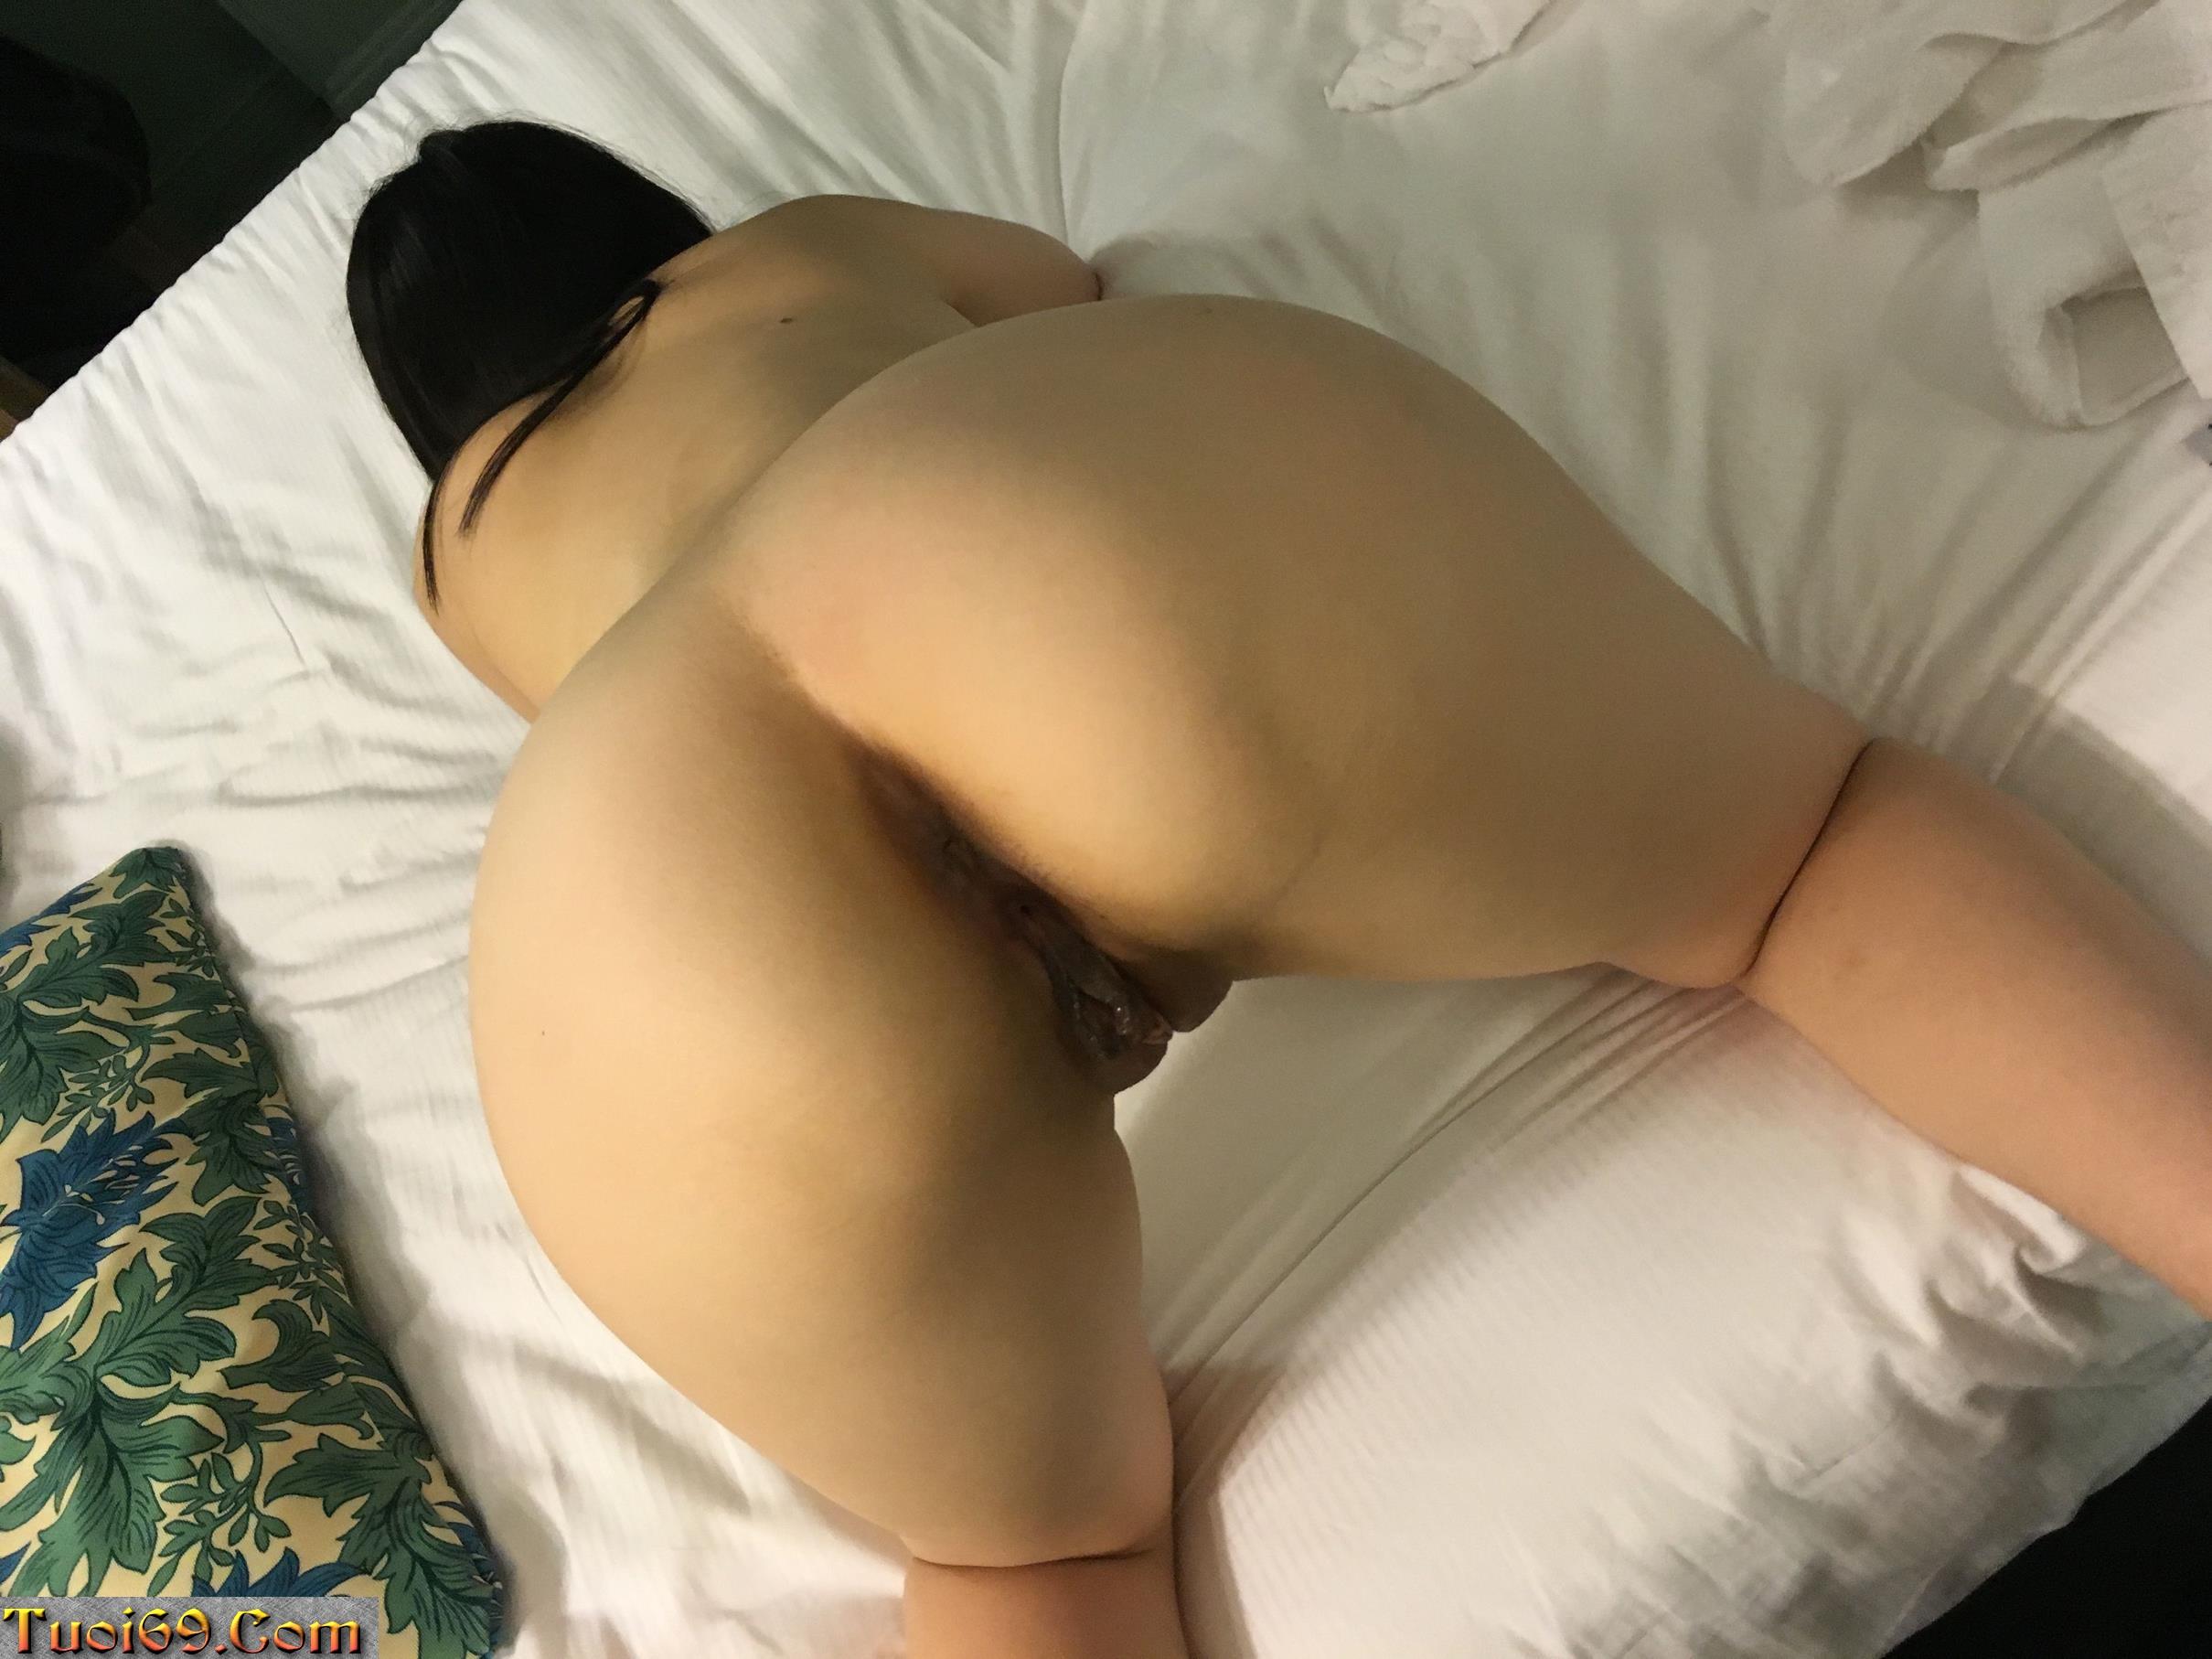 Cute-Korean-Carmen-nice-boobs-wet-pussy-masturbate-and-sex-photos-leaked-42-Copy